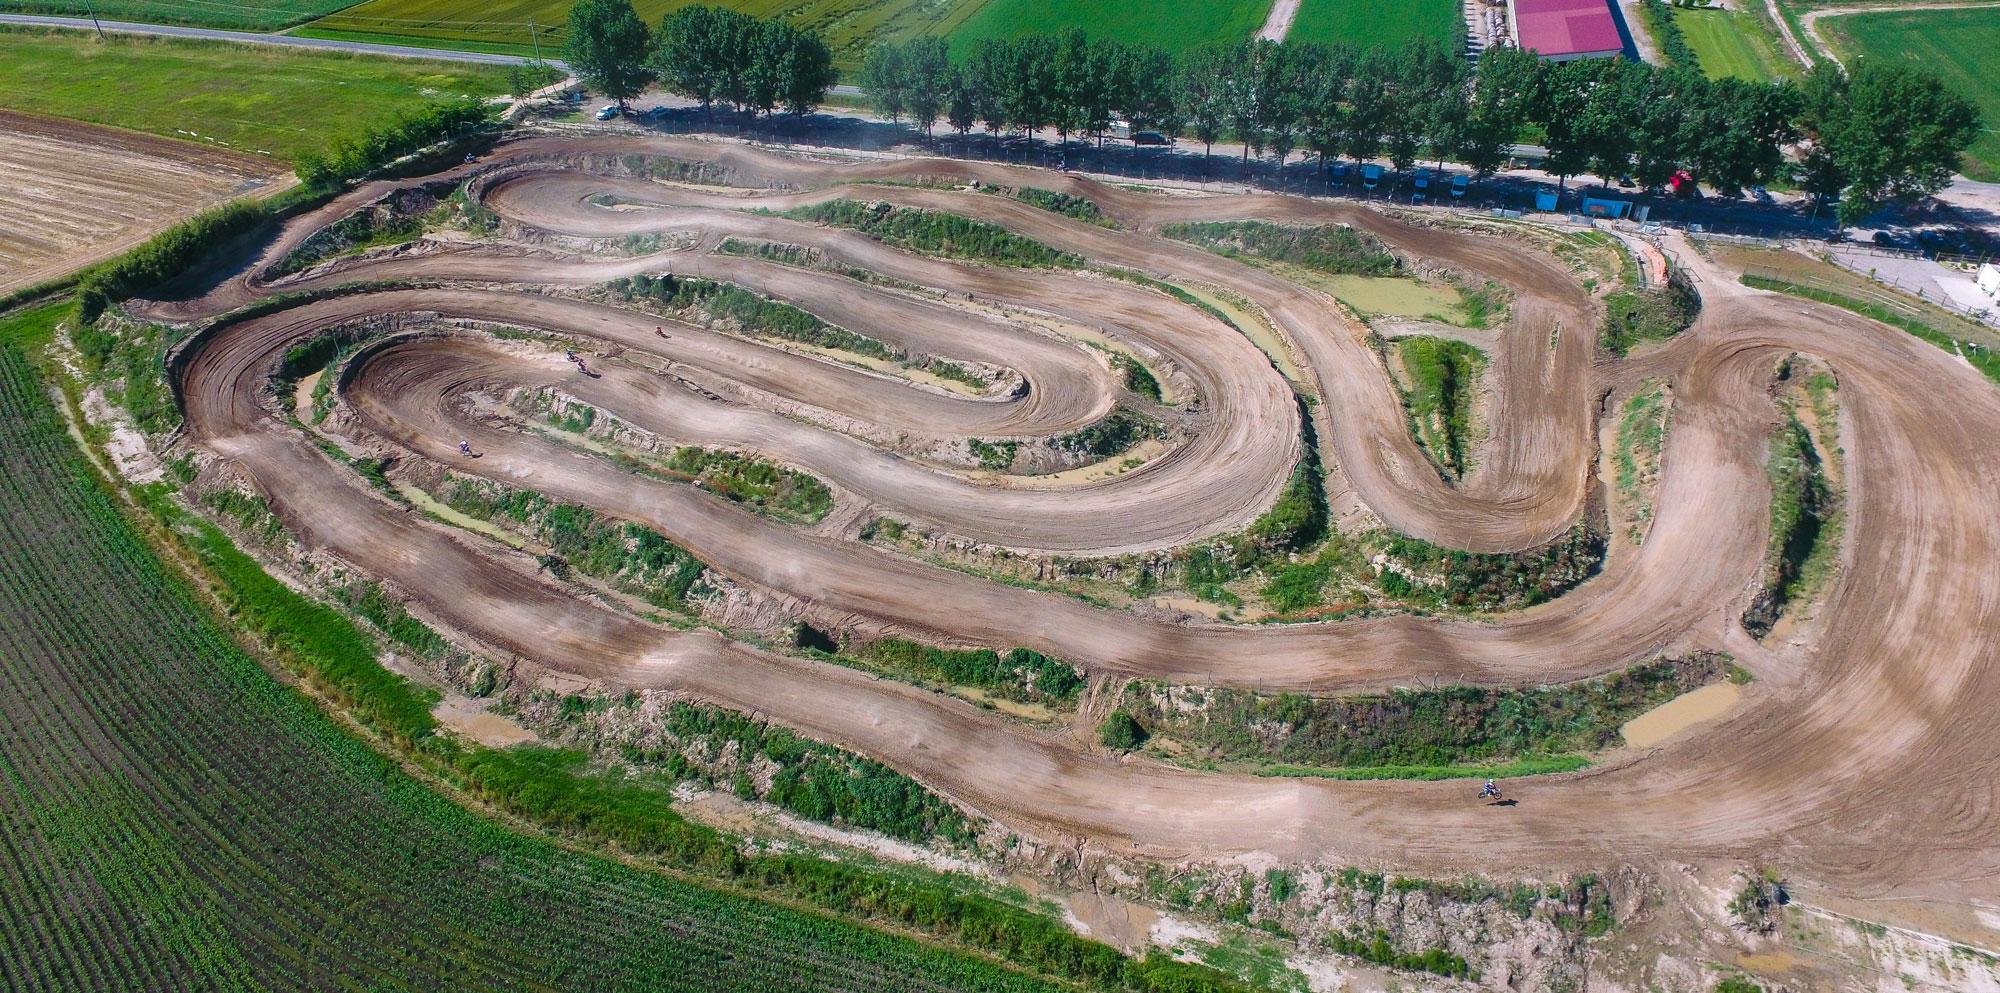 pista motocross sabbia